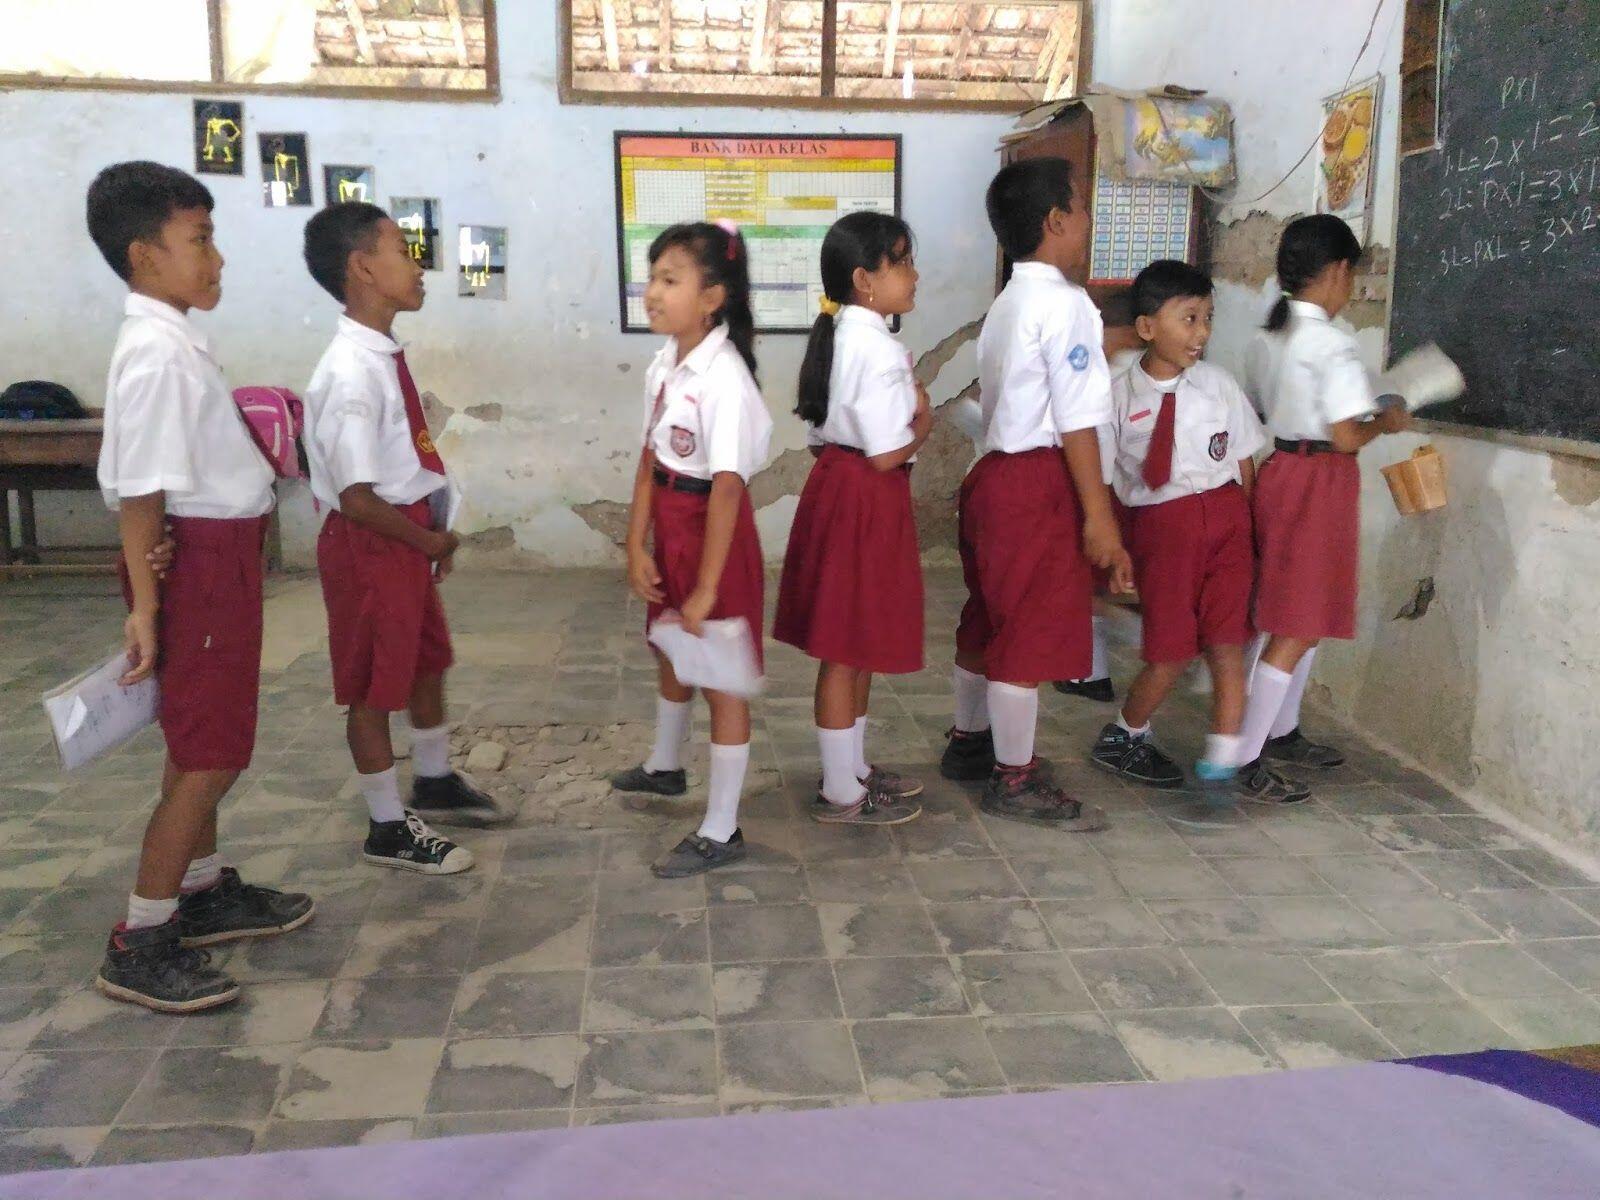 UNICEF Kirim Bantuan Rp10 Miliar untuk Anak Korban Bencana Sulteng